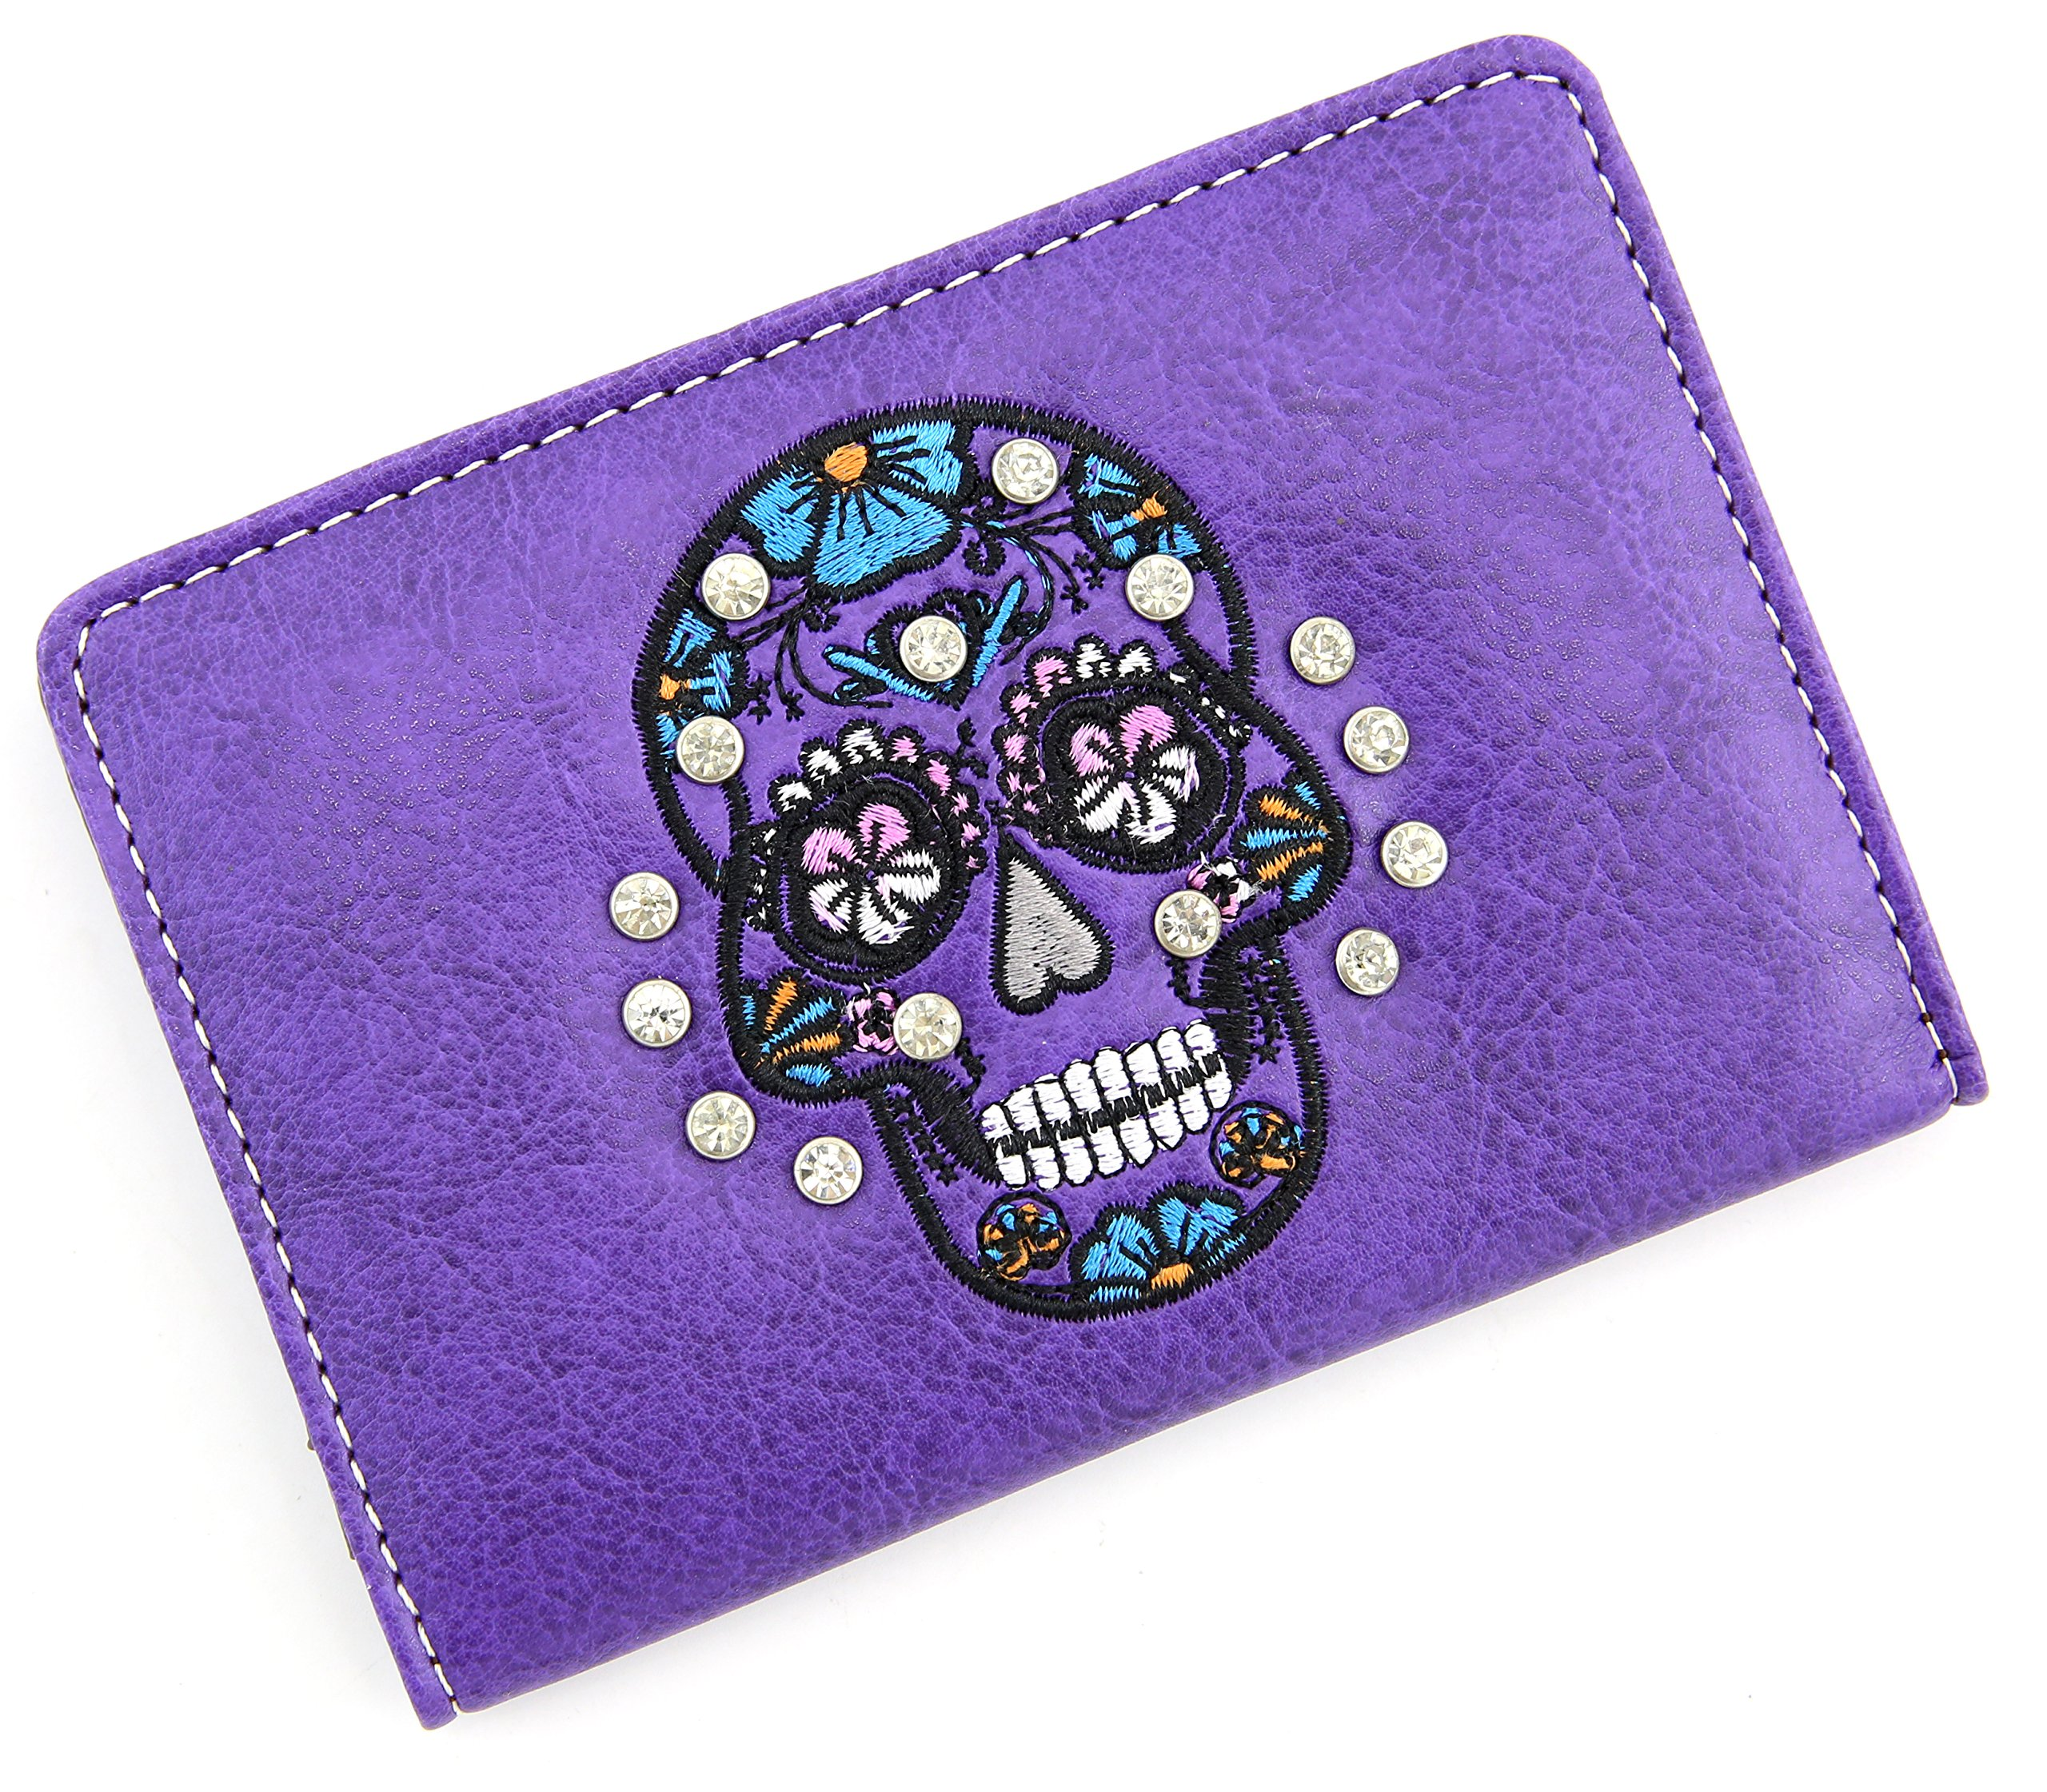 Travel Passport Holder Sugar Skull Cover Slim Id Card Case for Men & Women Travel Wallet Securely Holds Business Cards Credit Cards (Purple)